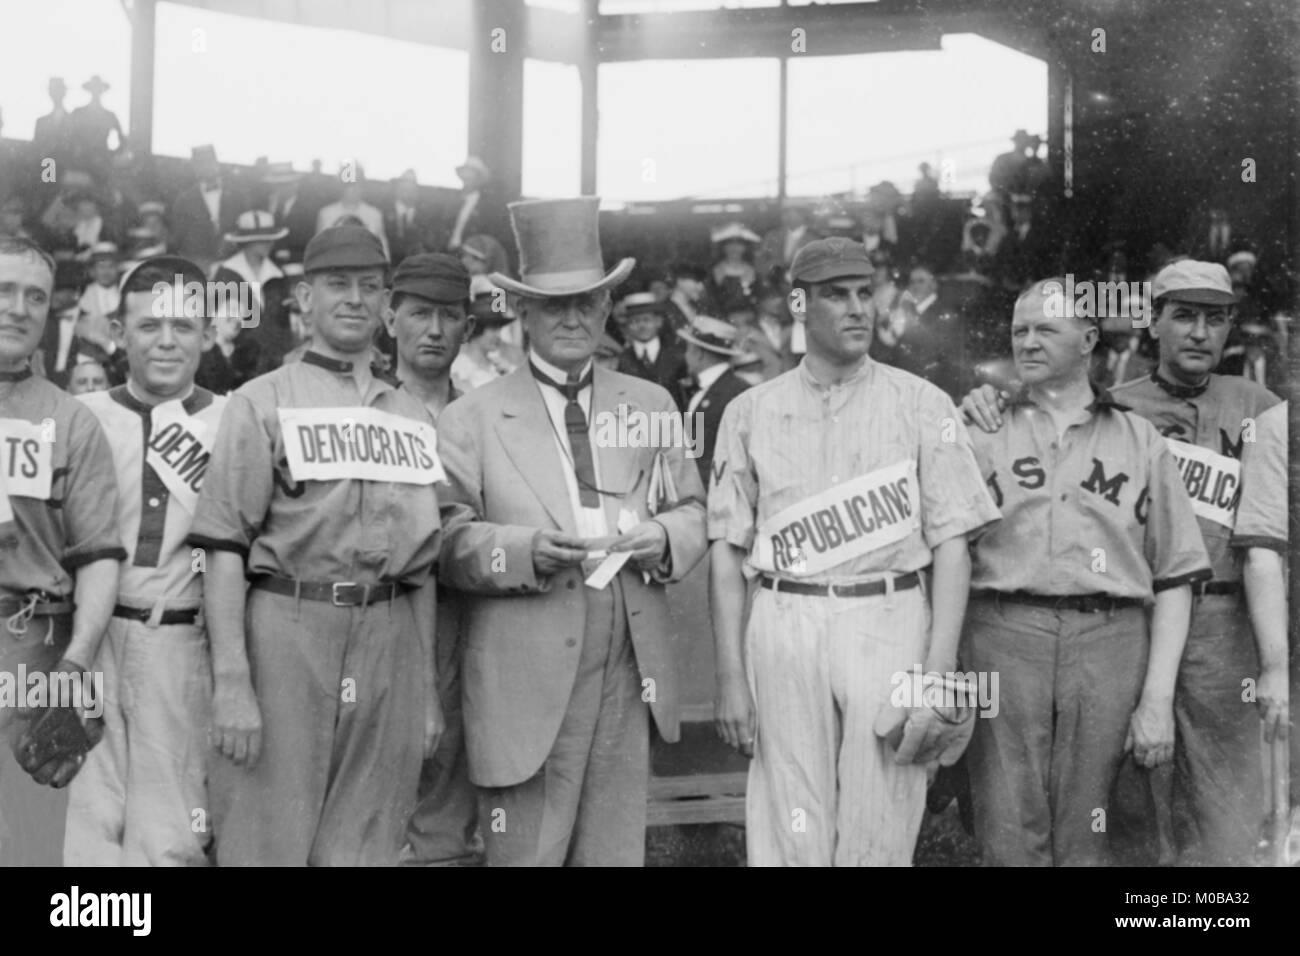 Washington Stadium host ballgame between Republicans & Democrats - Stock Image